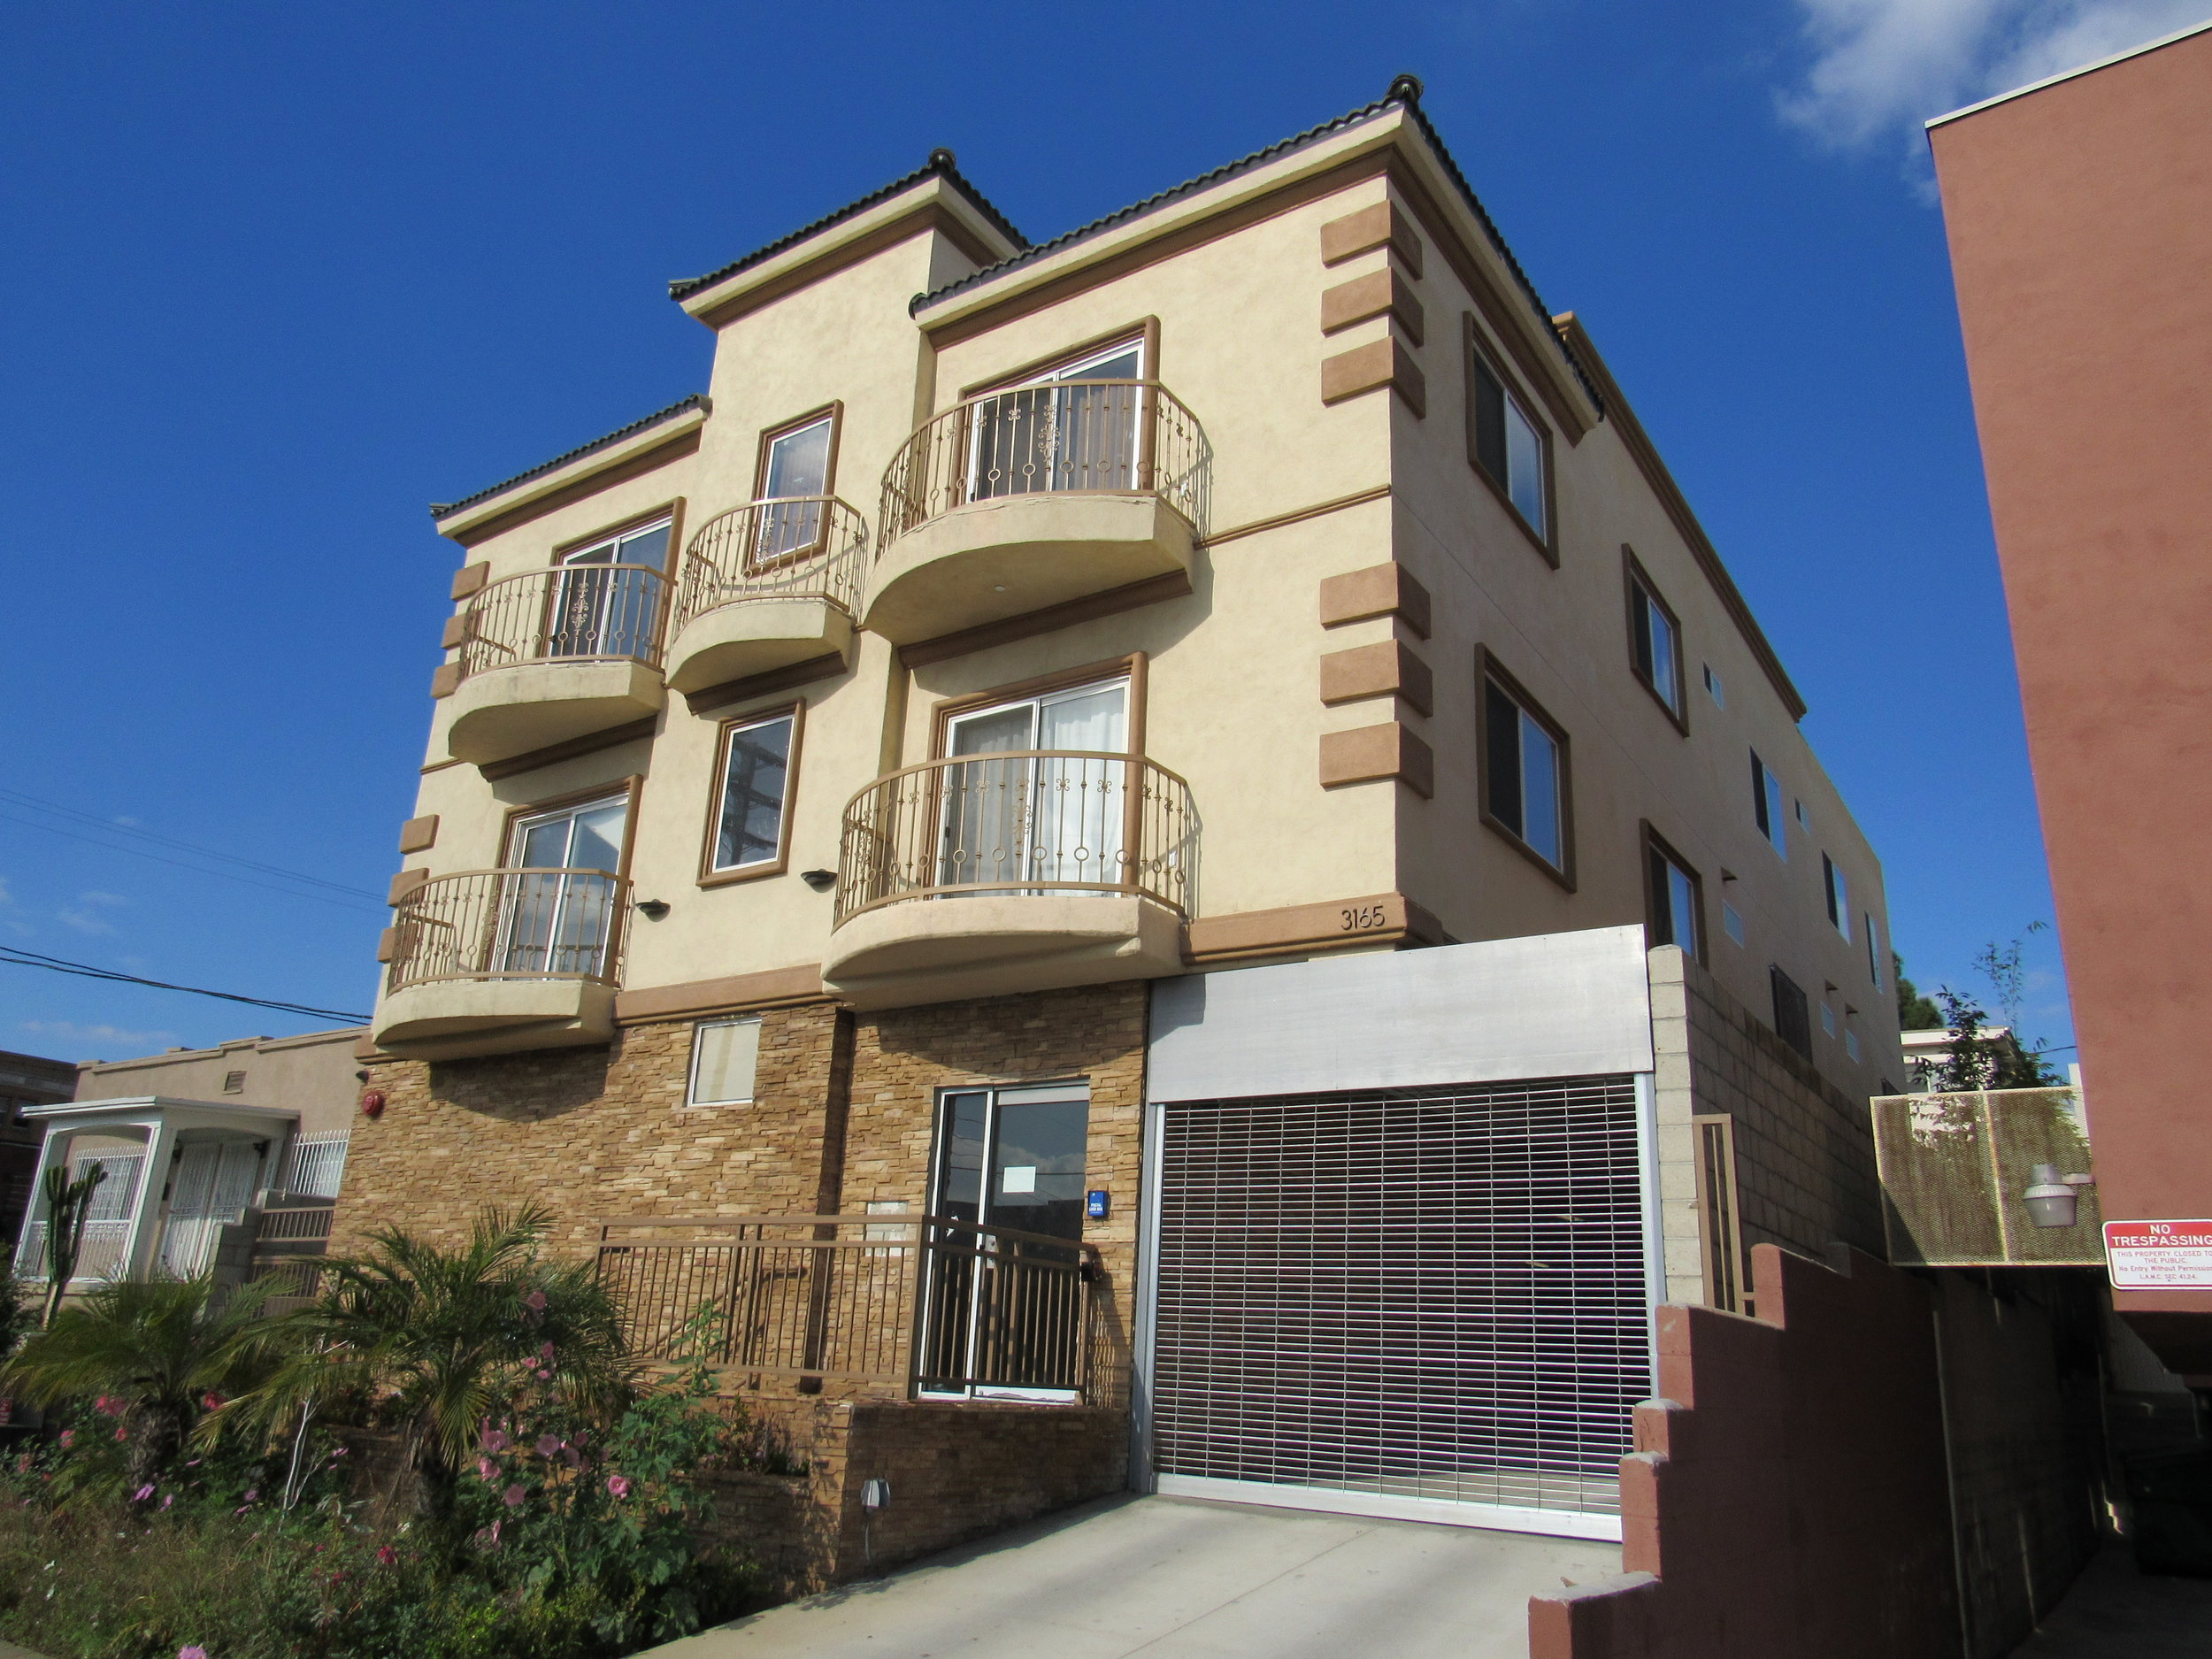 11 St: 4-Unit Apartment